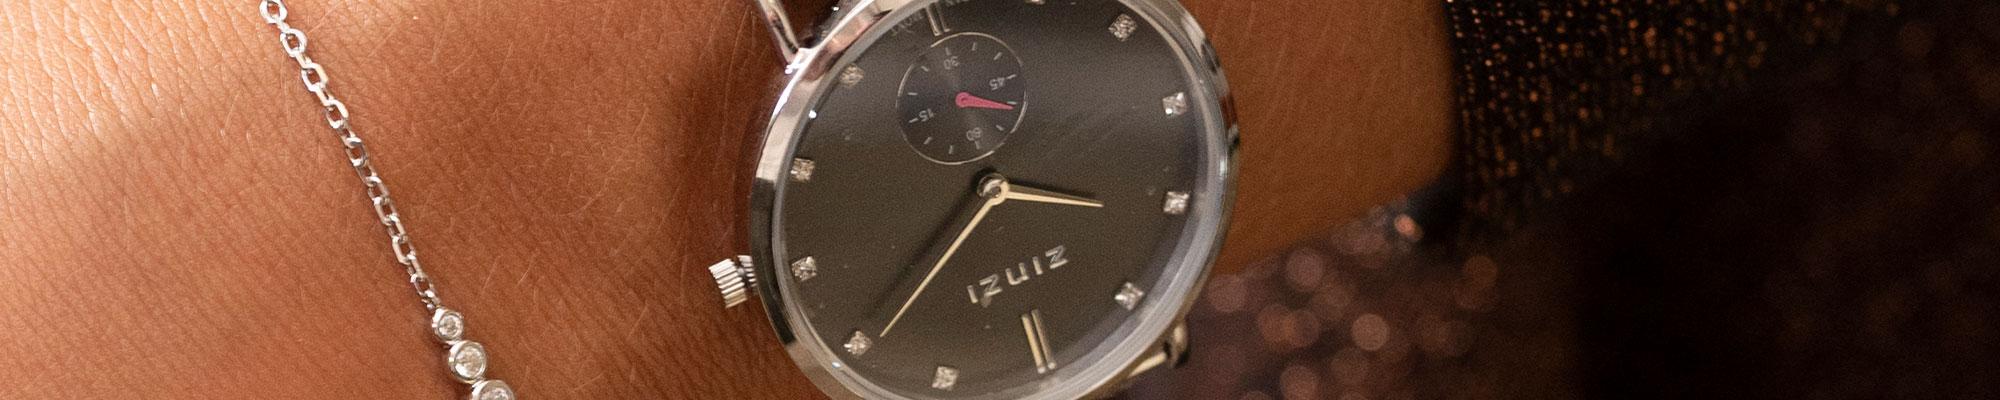 Glam Watches